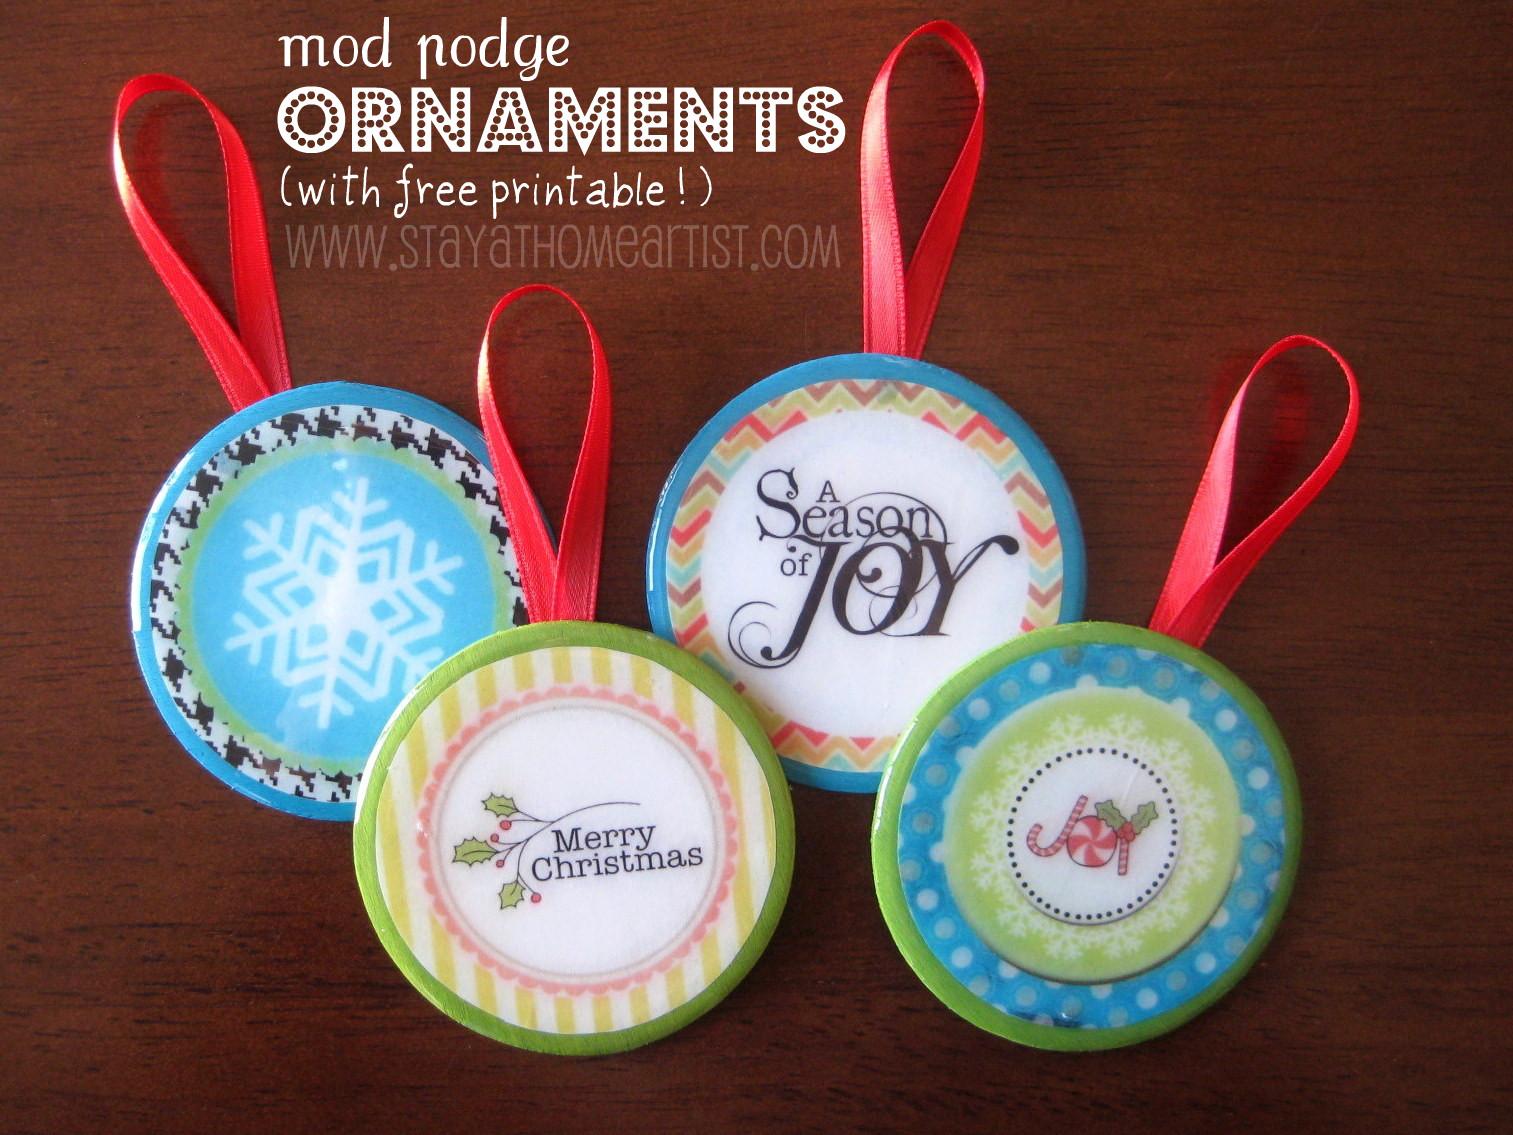 stayathomeartist.com: mod podge ornaments with free printable...